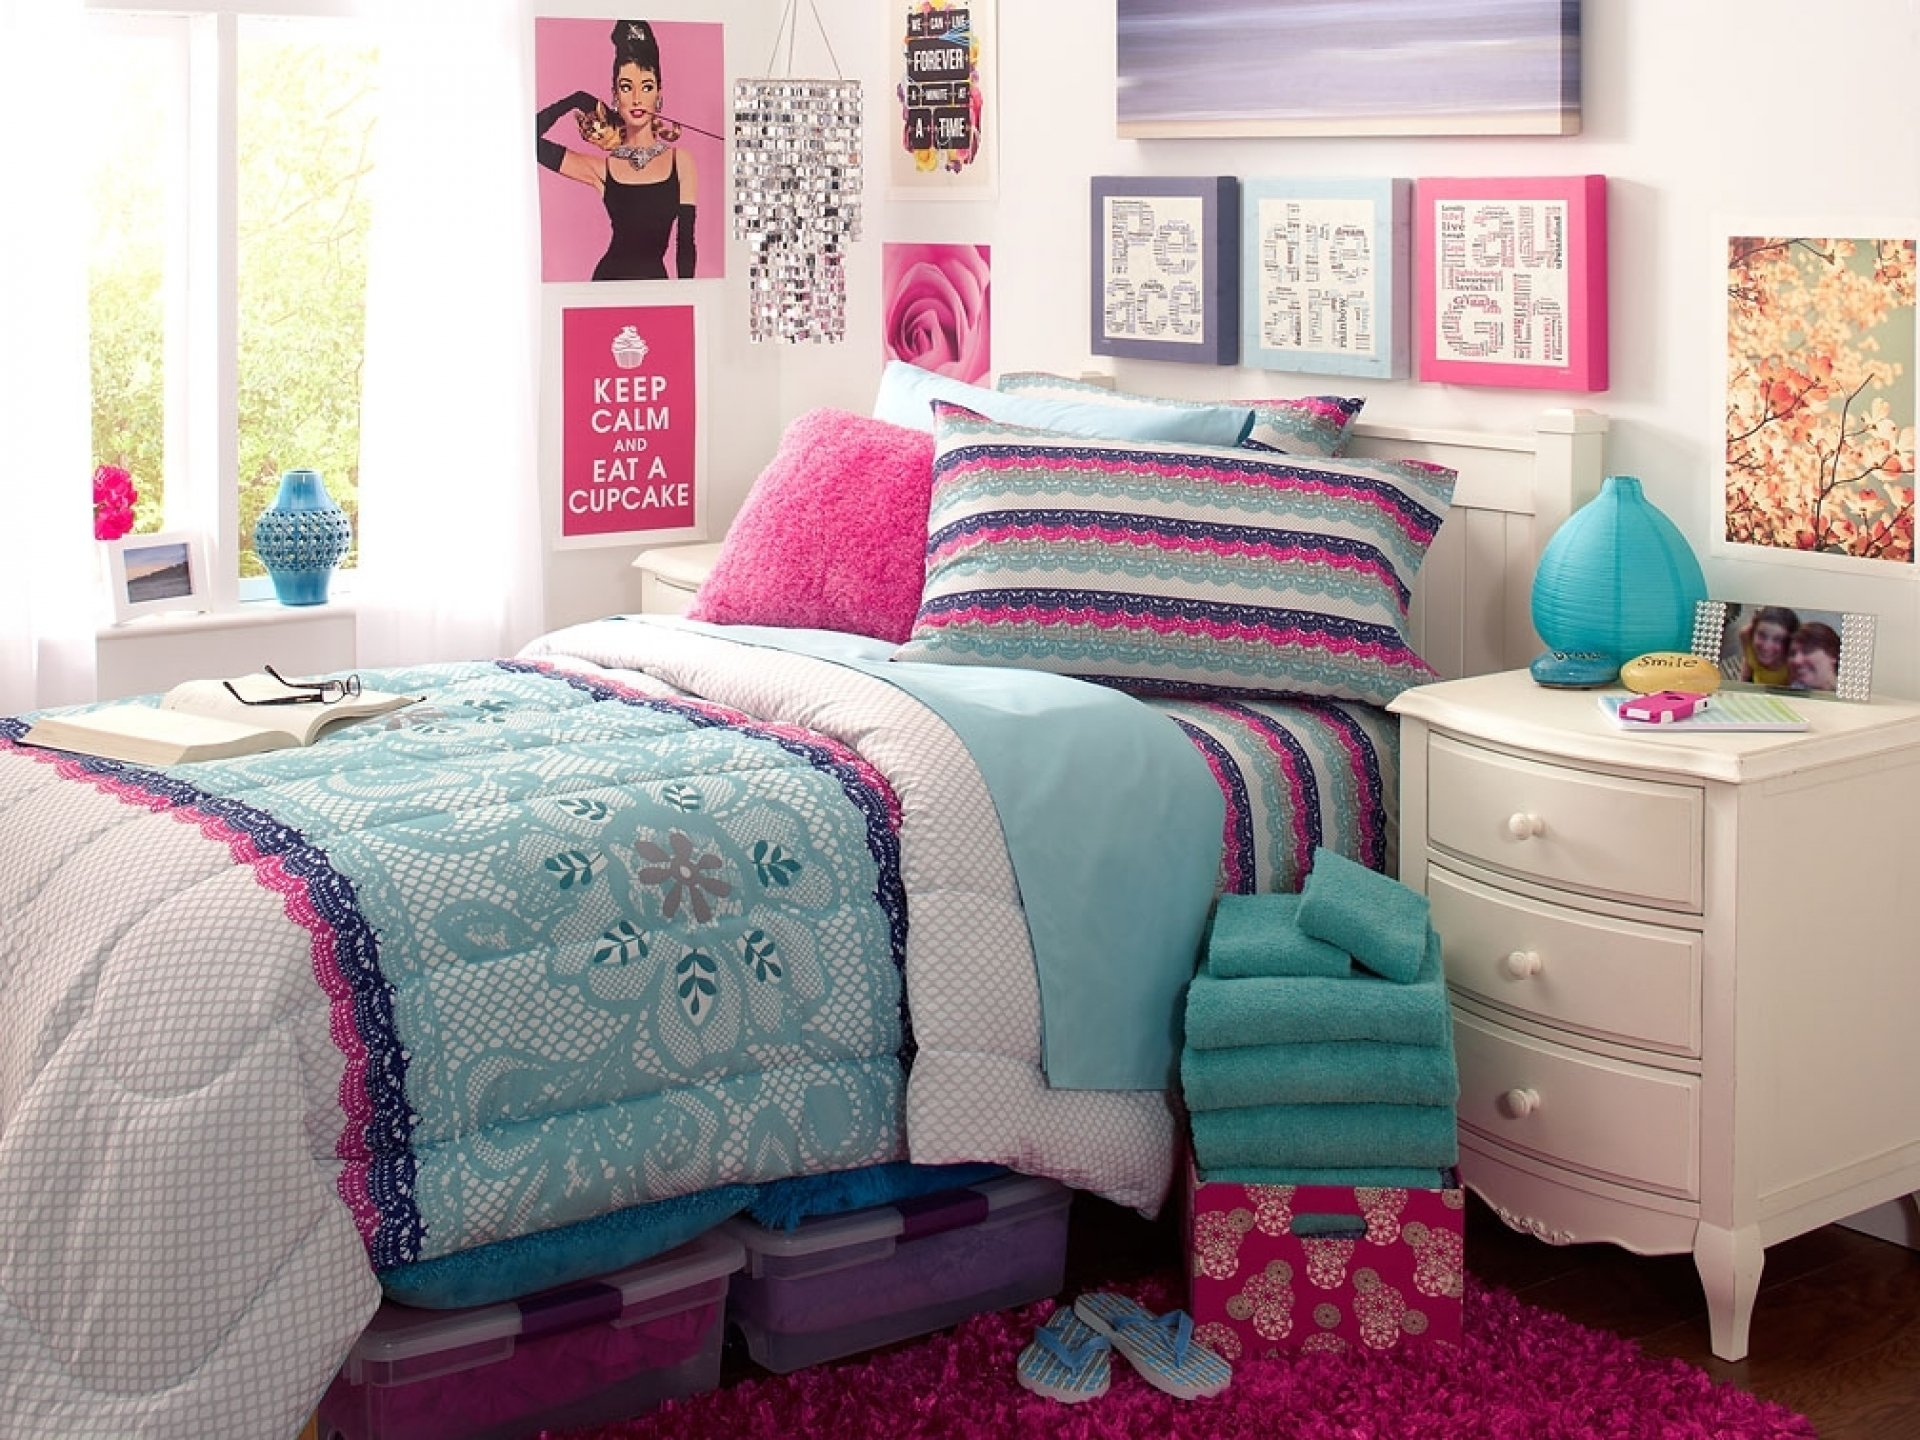 10 Fashionable Cute Bedroom Ideas For Teenage Girls cute teen bedroom ideas for girl teens room unique girls blue 2020